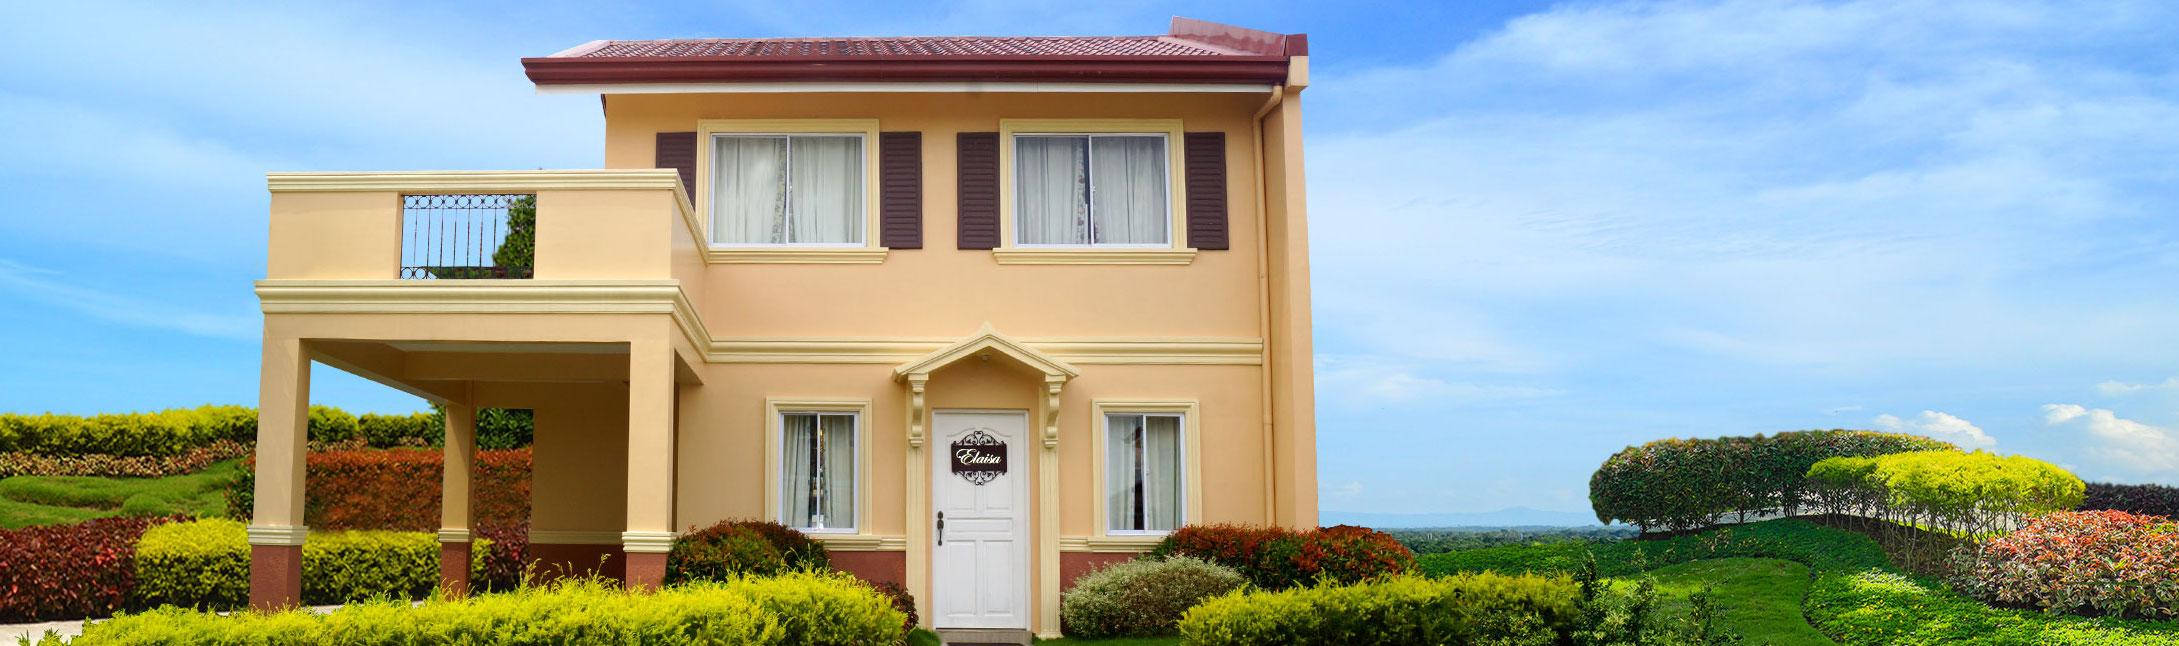 Photo 5br House Plans Images 5br House Plans Images